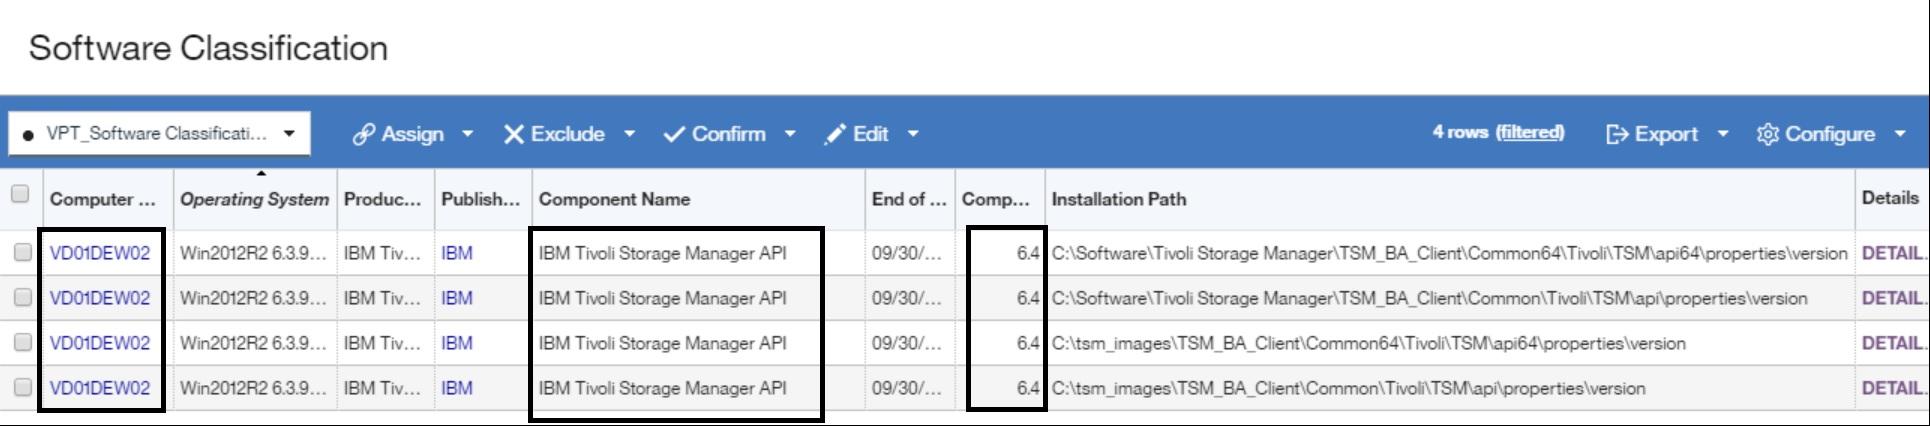 Software Report